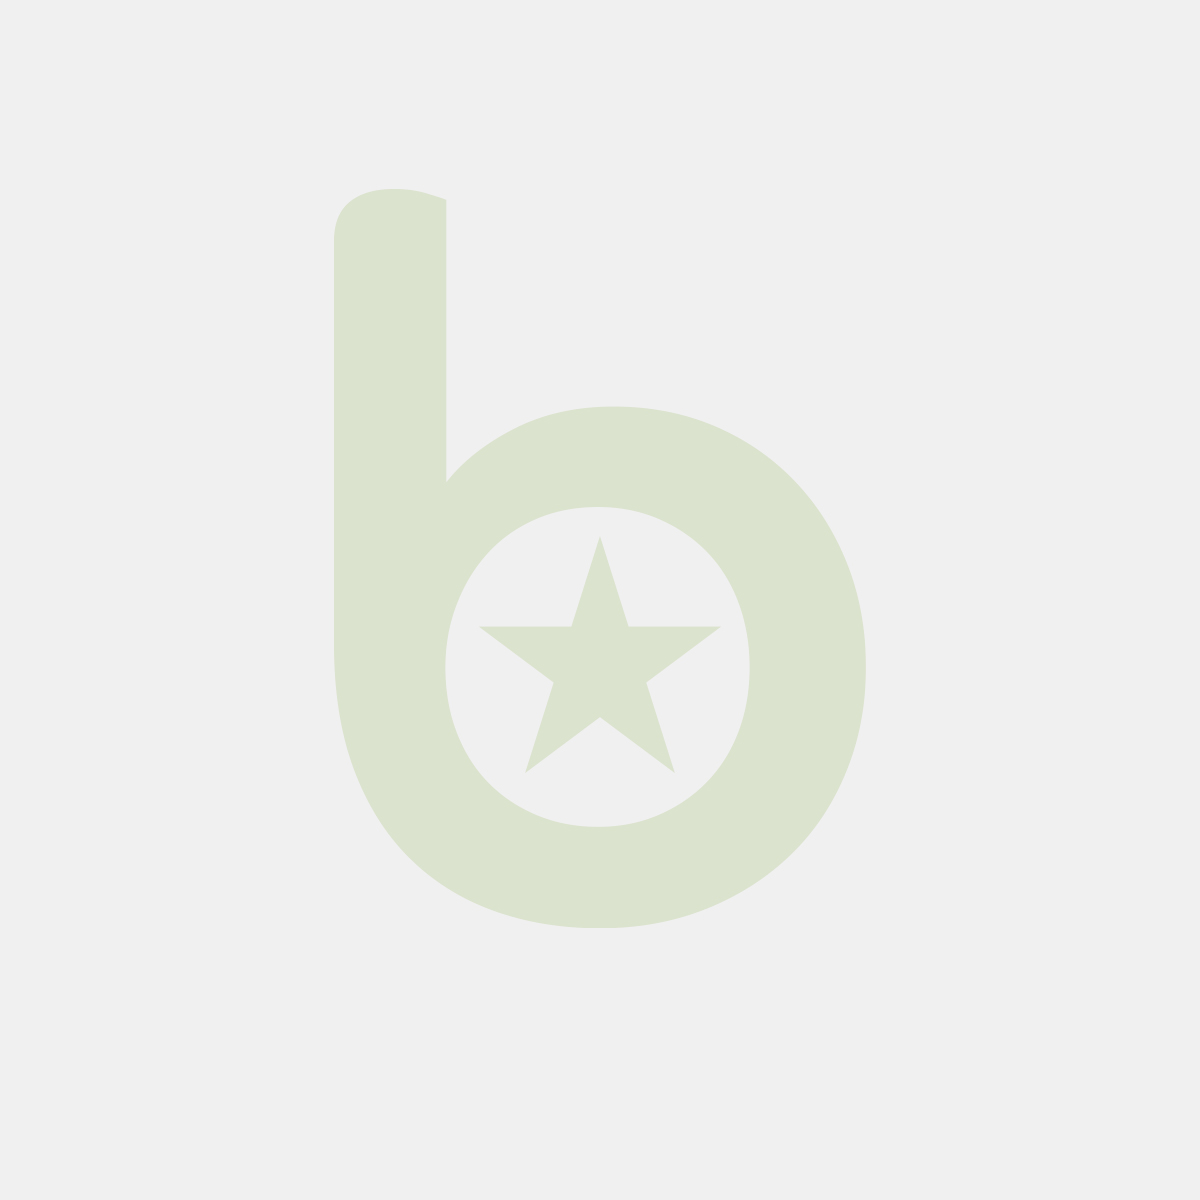 FINGERFOOD - pucharek PS transparentny 9,2x7,2x3 op. 50 sztuk